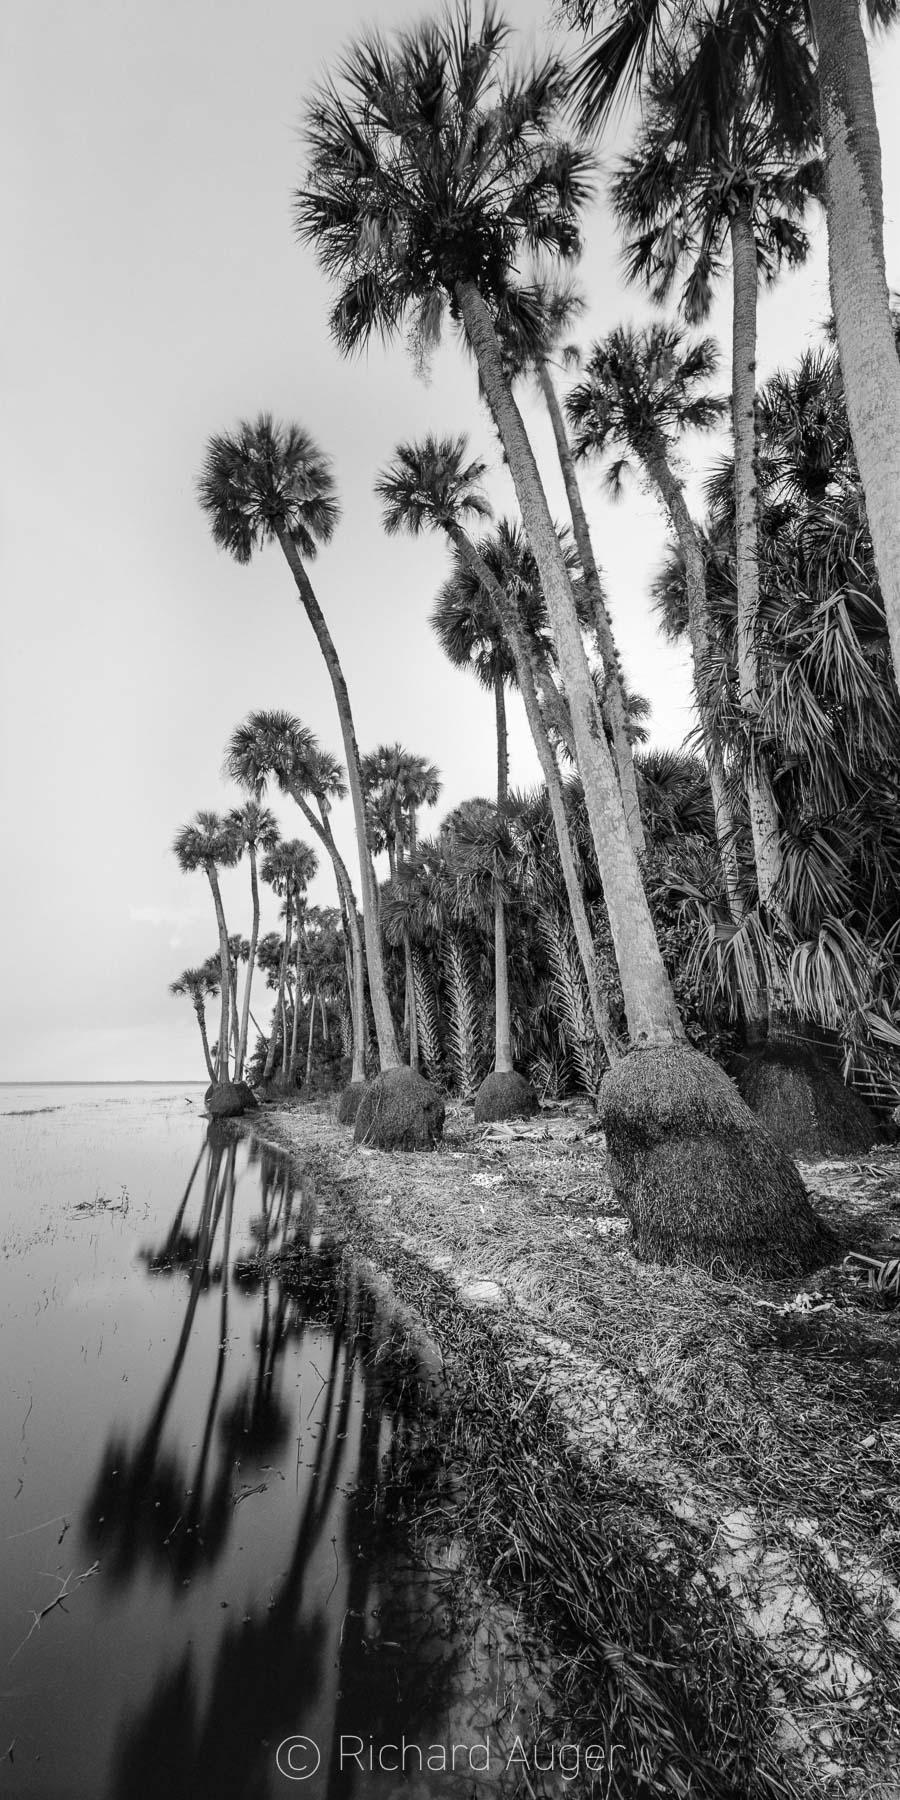 St Johns River, Florida, Swamp, Lake, Sabal Palm Trees, Fog, Black and White, Stillness, Vertical Panorama